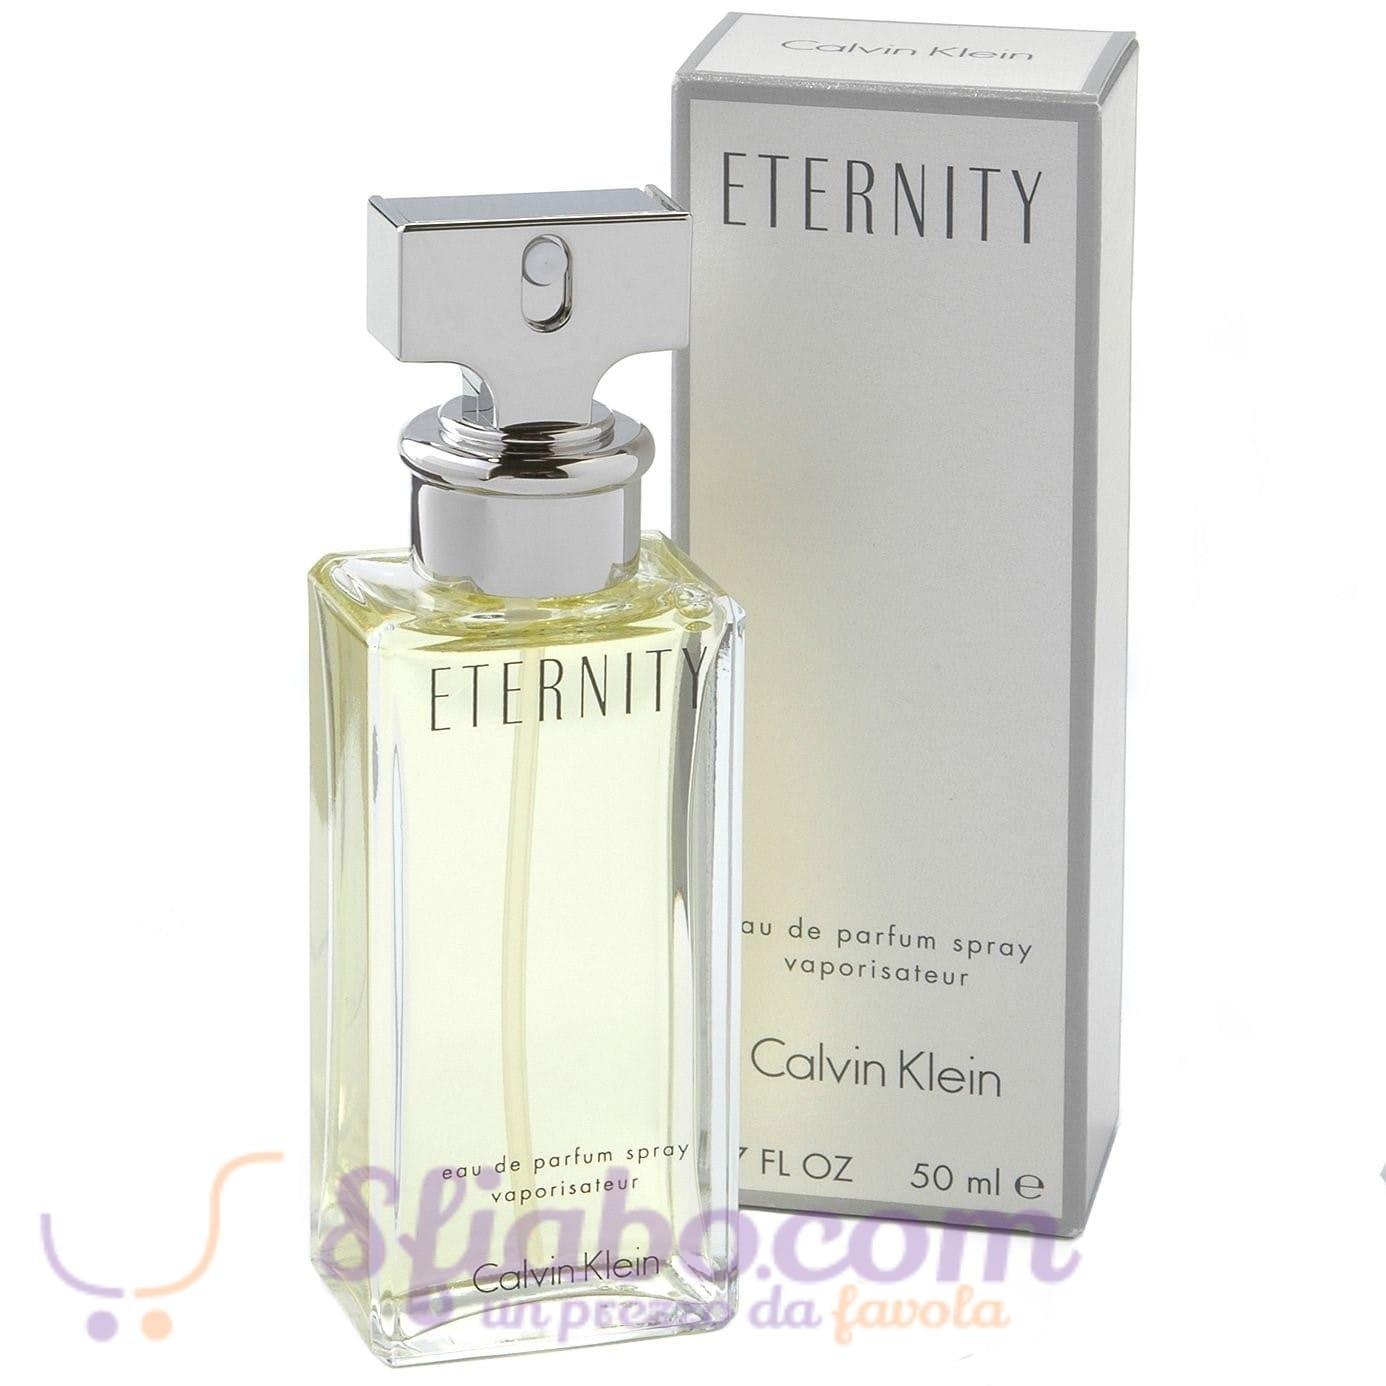 591158edcf4da6 Profumo Donna Calvin Klein Eternity EDP 50ml